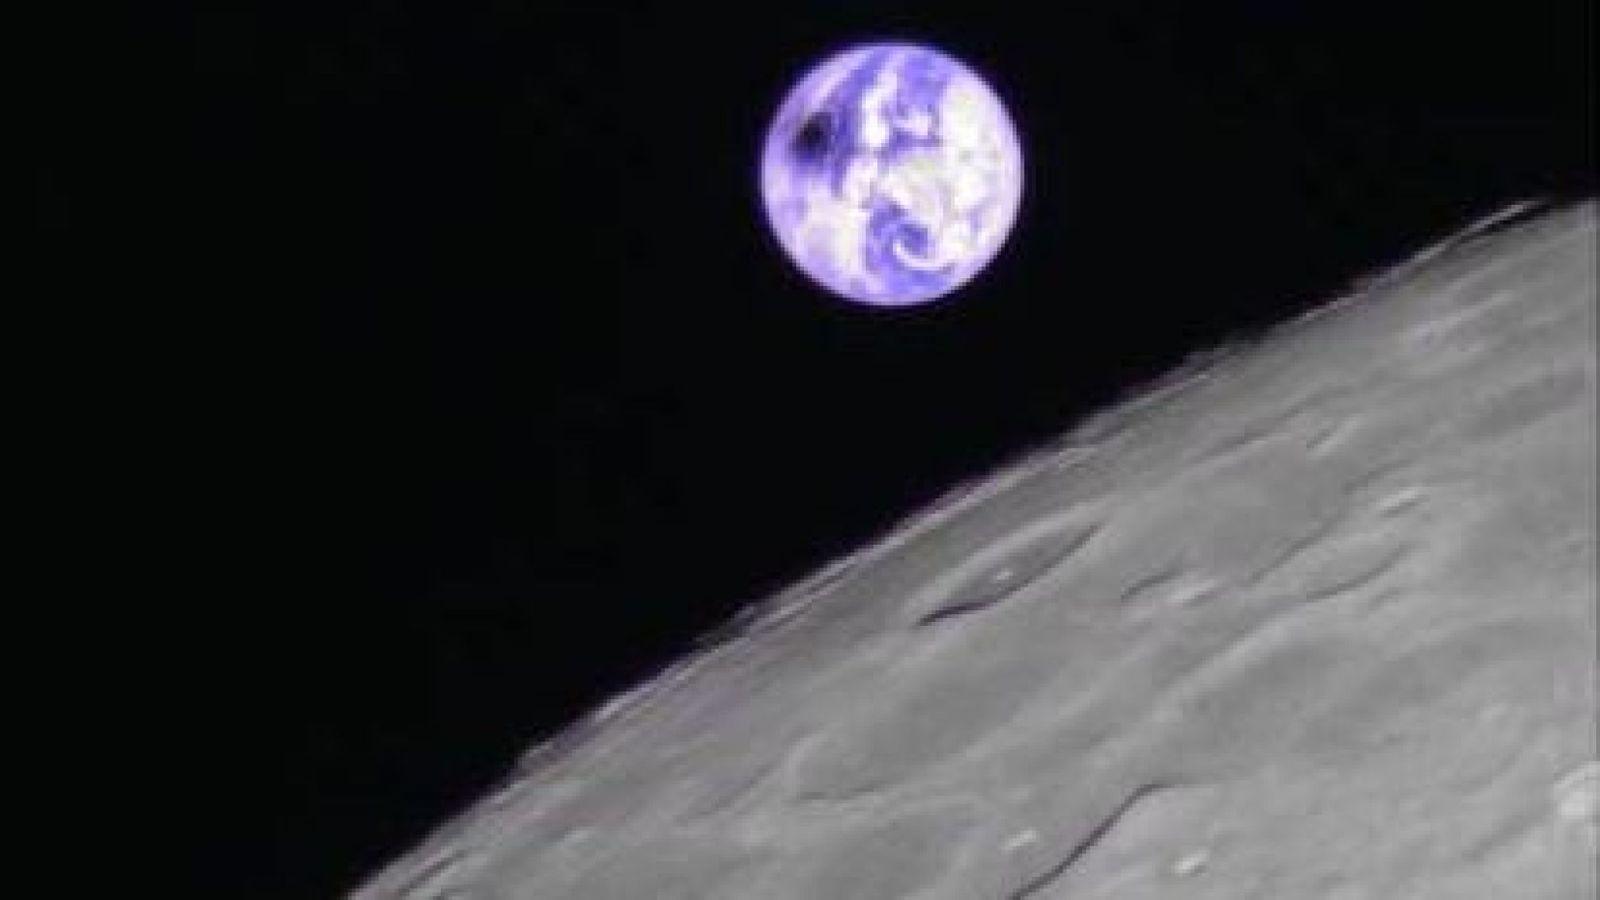 Lunar satellite captures stunning images of solar eclipse